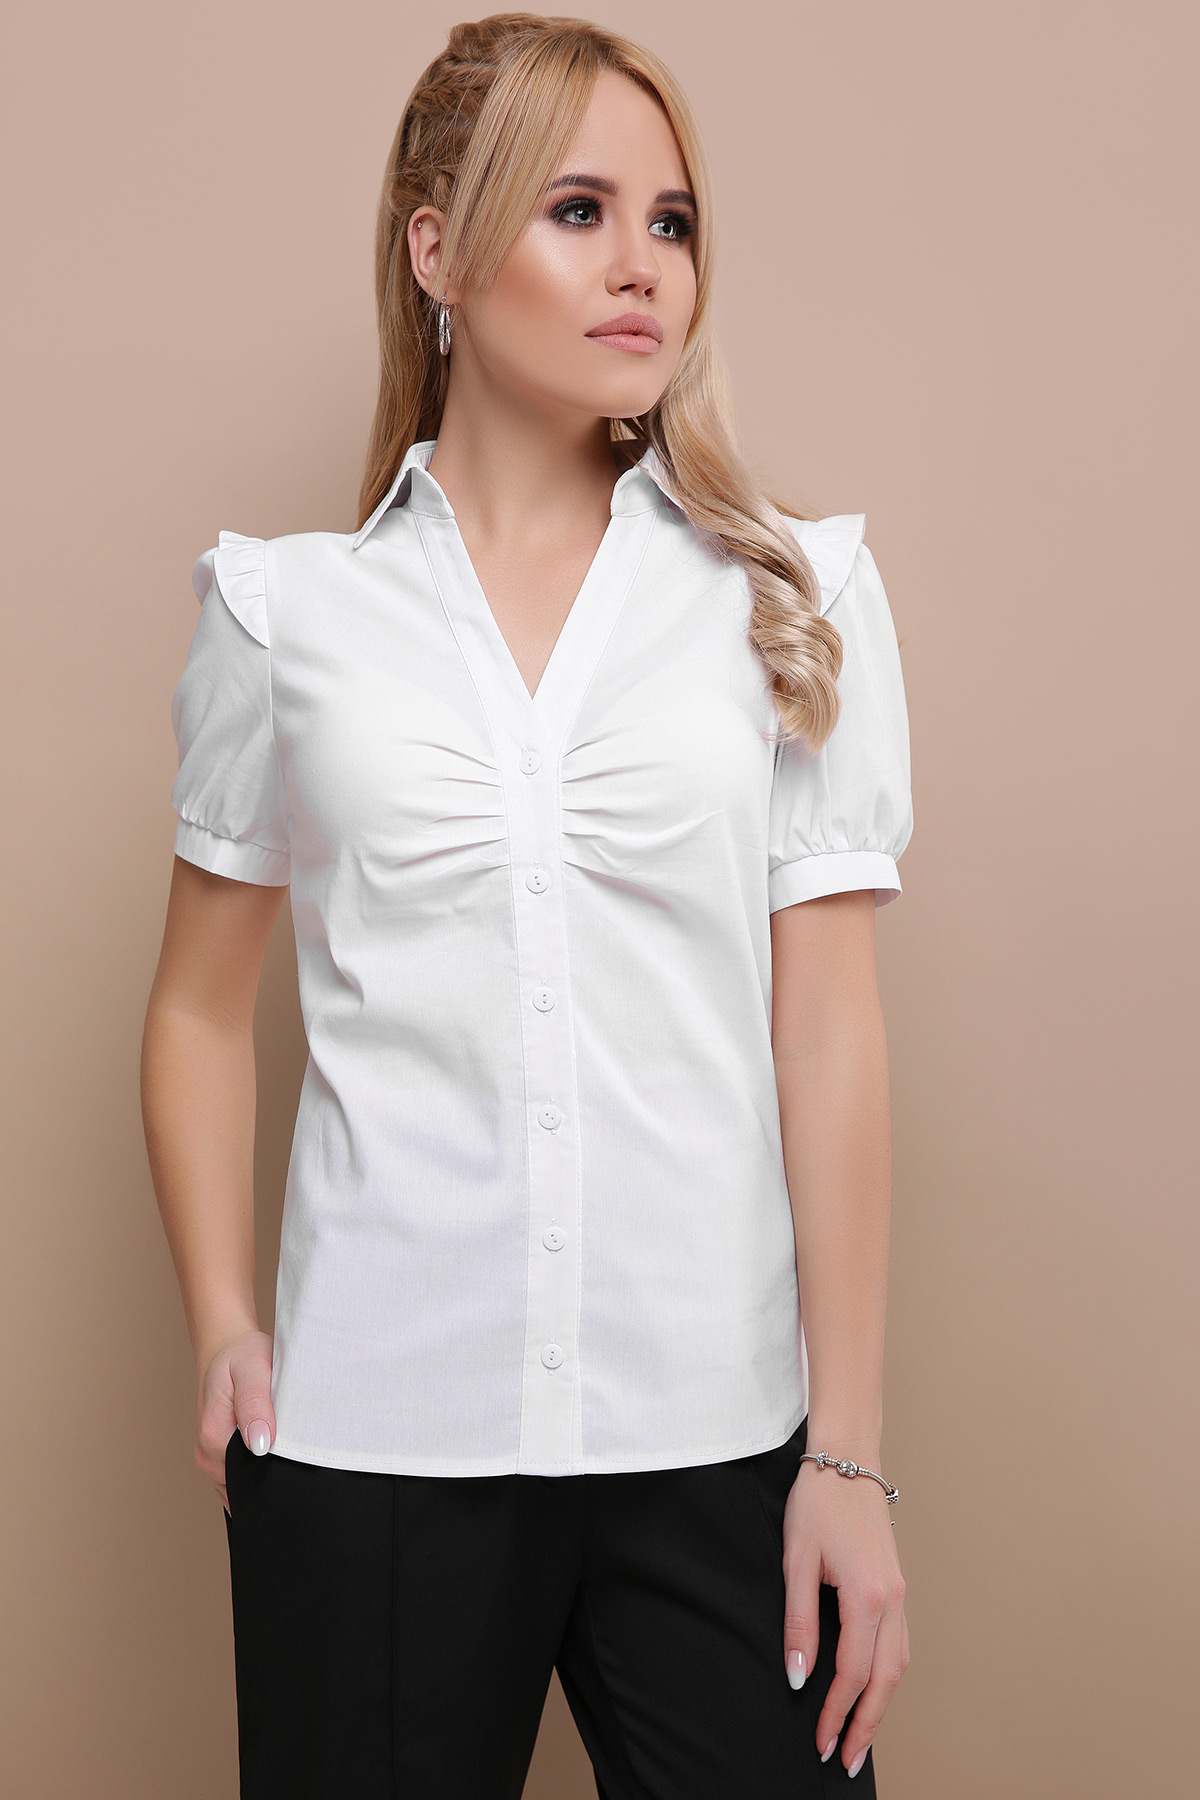 b6c38033cb9 голубая блузка с рюшами. блуза Маргарита к р. Цвет  белый